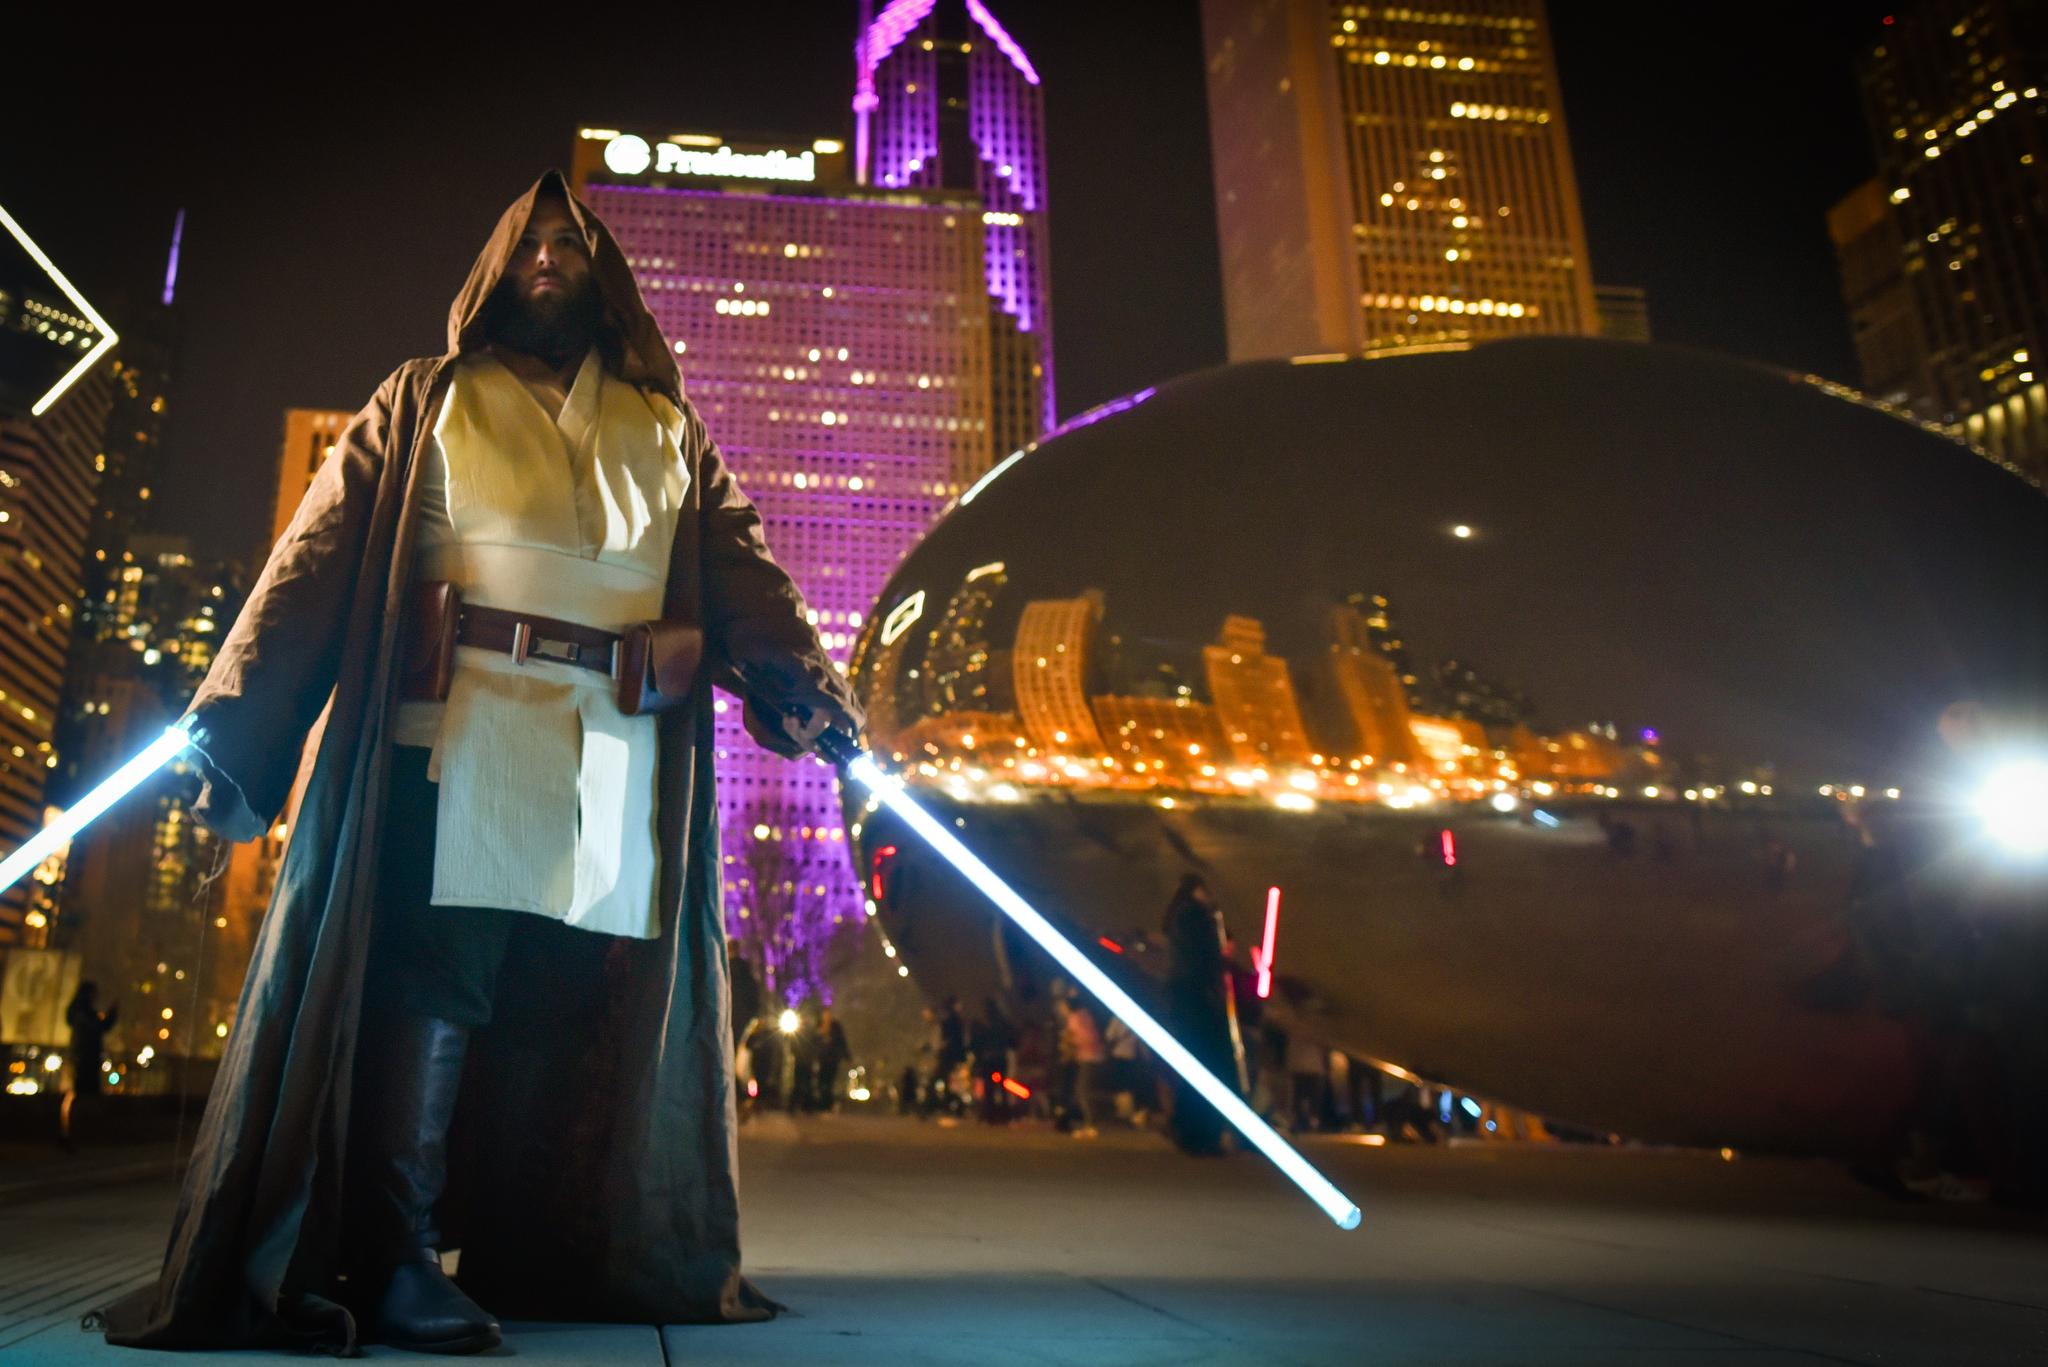 2019.04.14 - Star Wars Celebration Chicago 288871.JPG